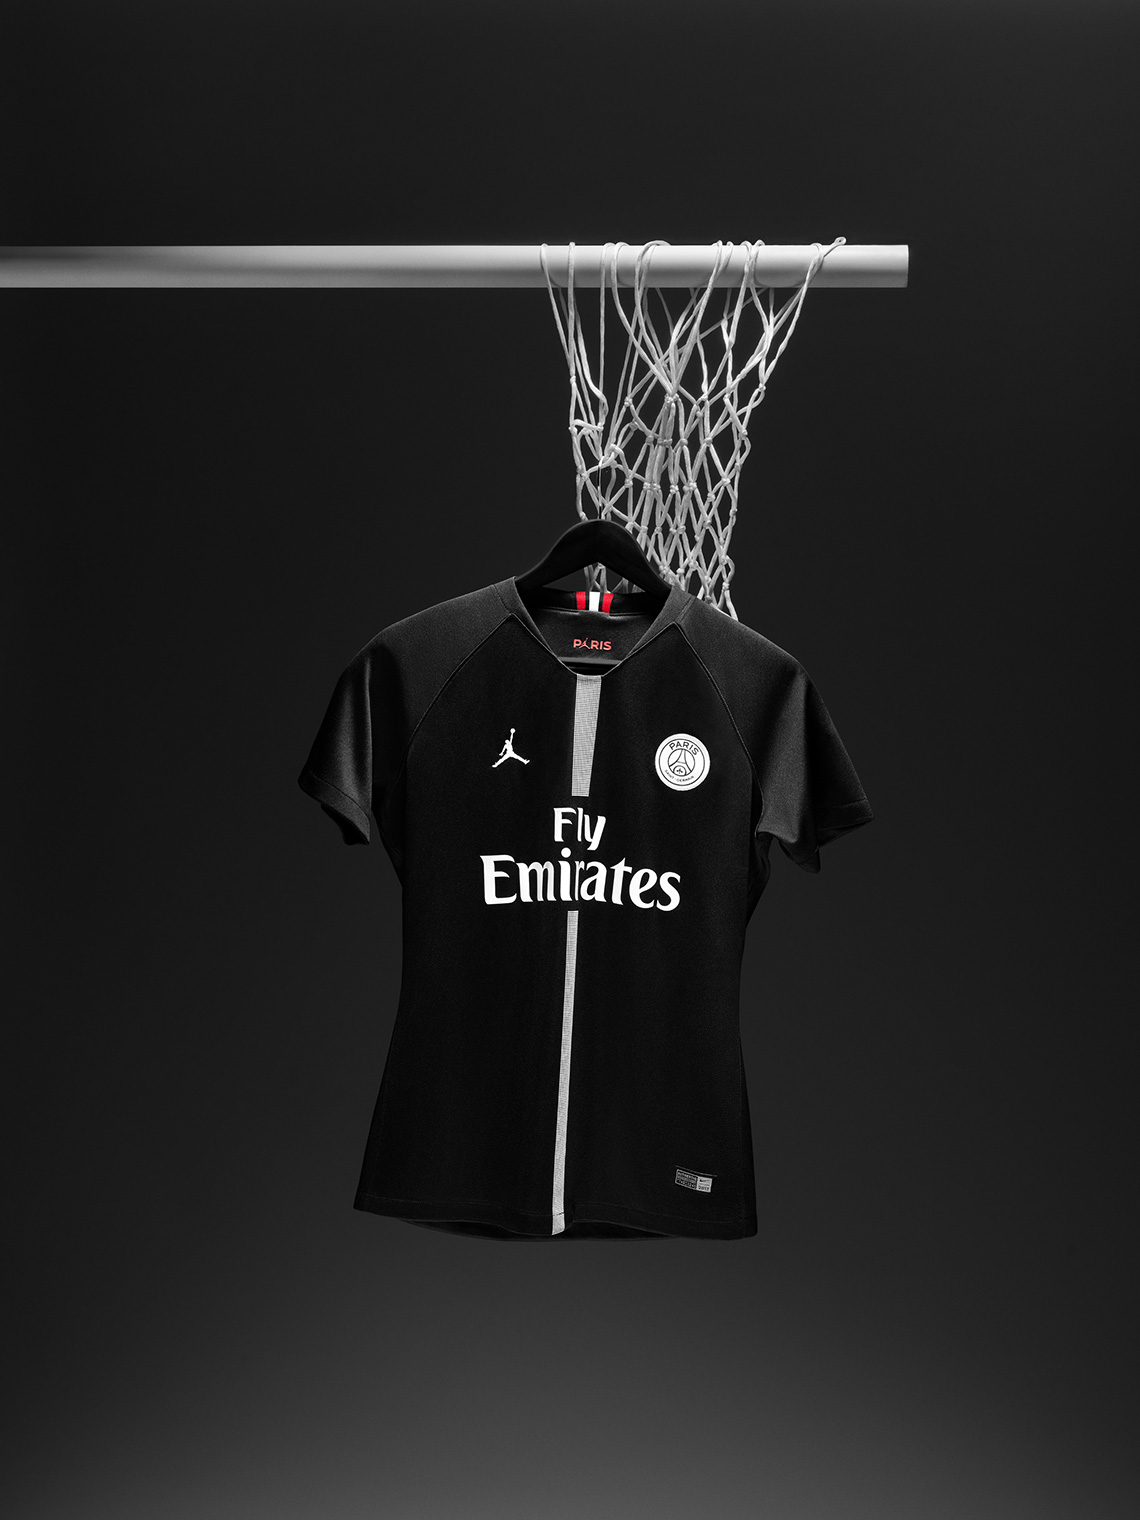 a4db37f3124 Jordan 5 PSG Paris Saint-Germain - Where To Buy | SneakerNews.com